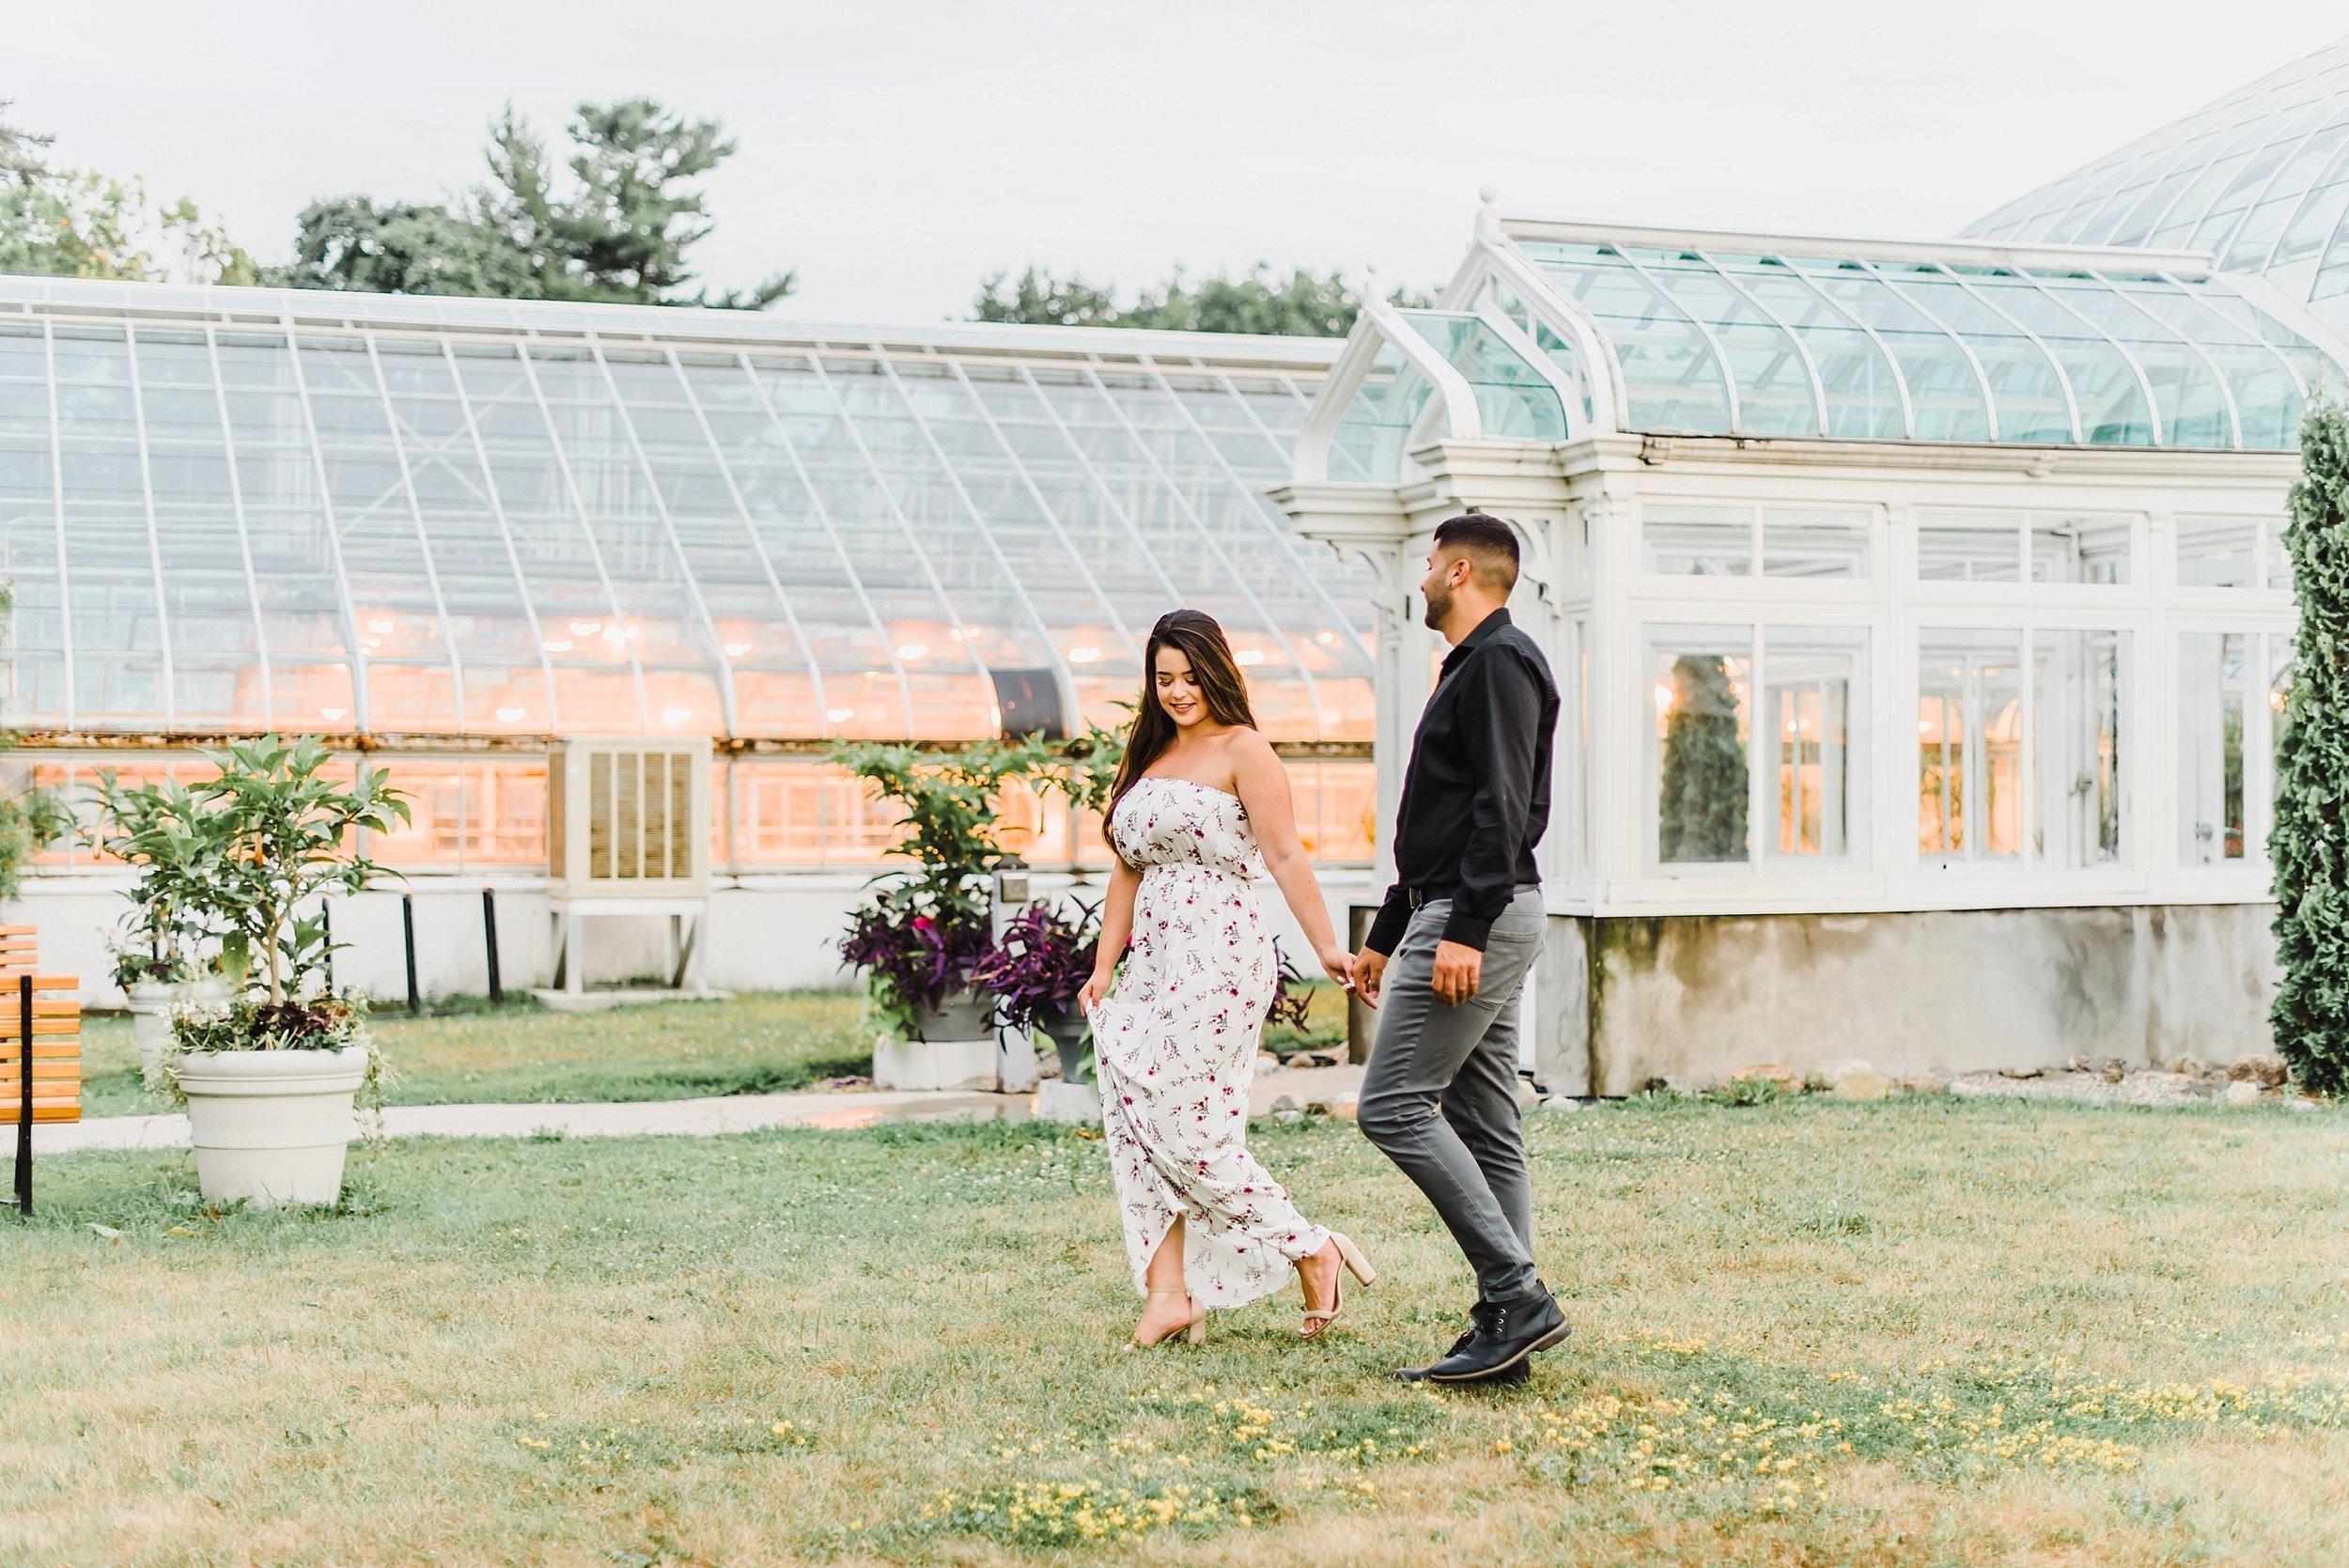 light airy indie fine art ottawa wedding photographer | Ali and Batoul Photography_0959.jpg